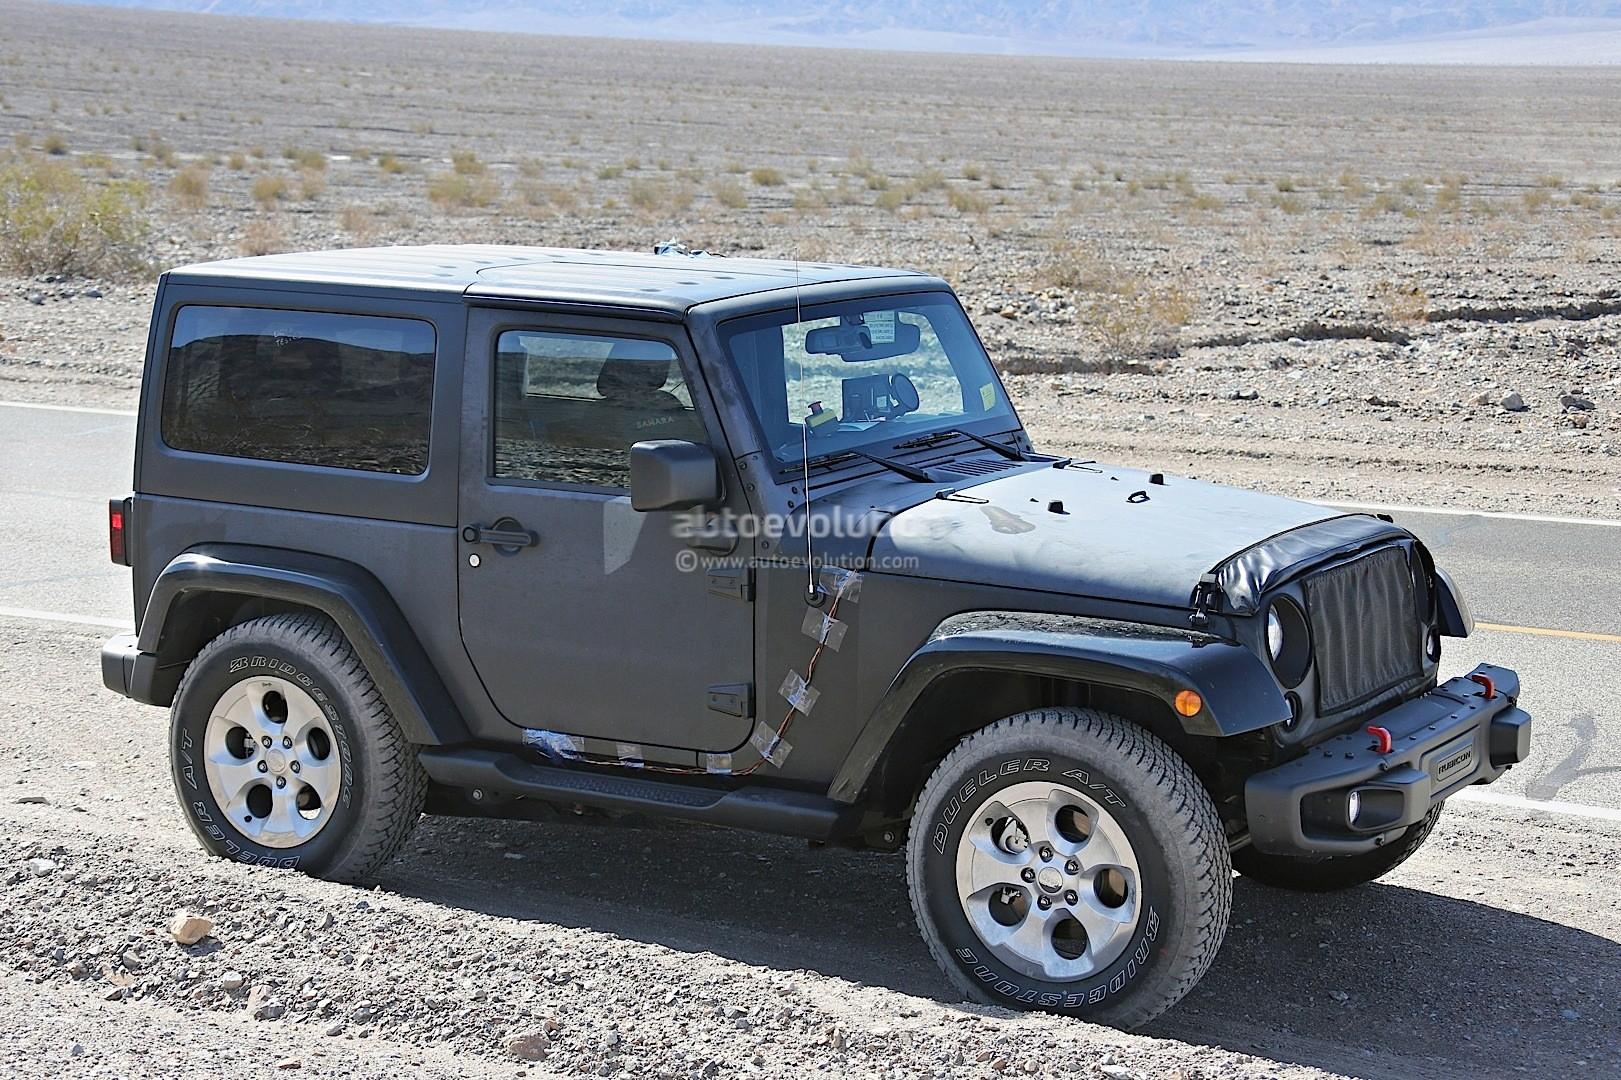 2018 jeep wrangler spyshot